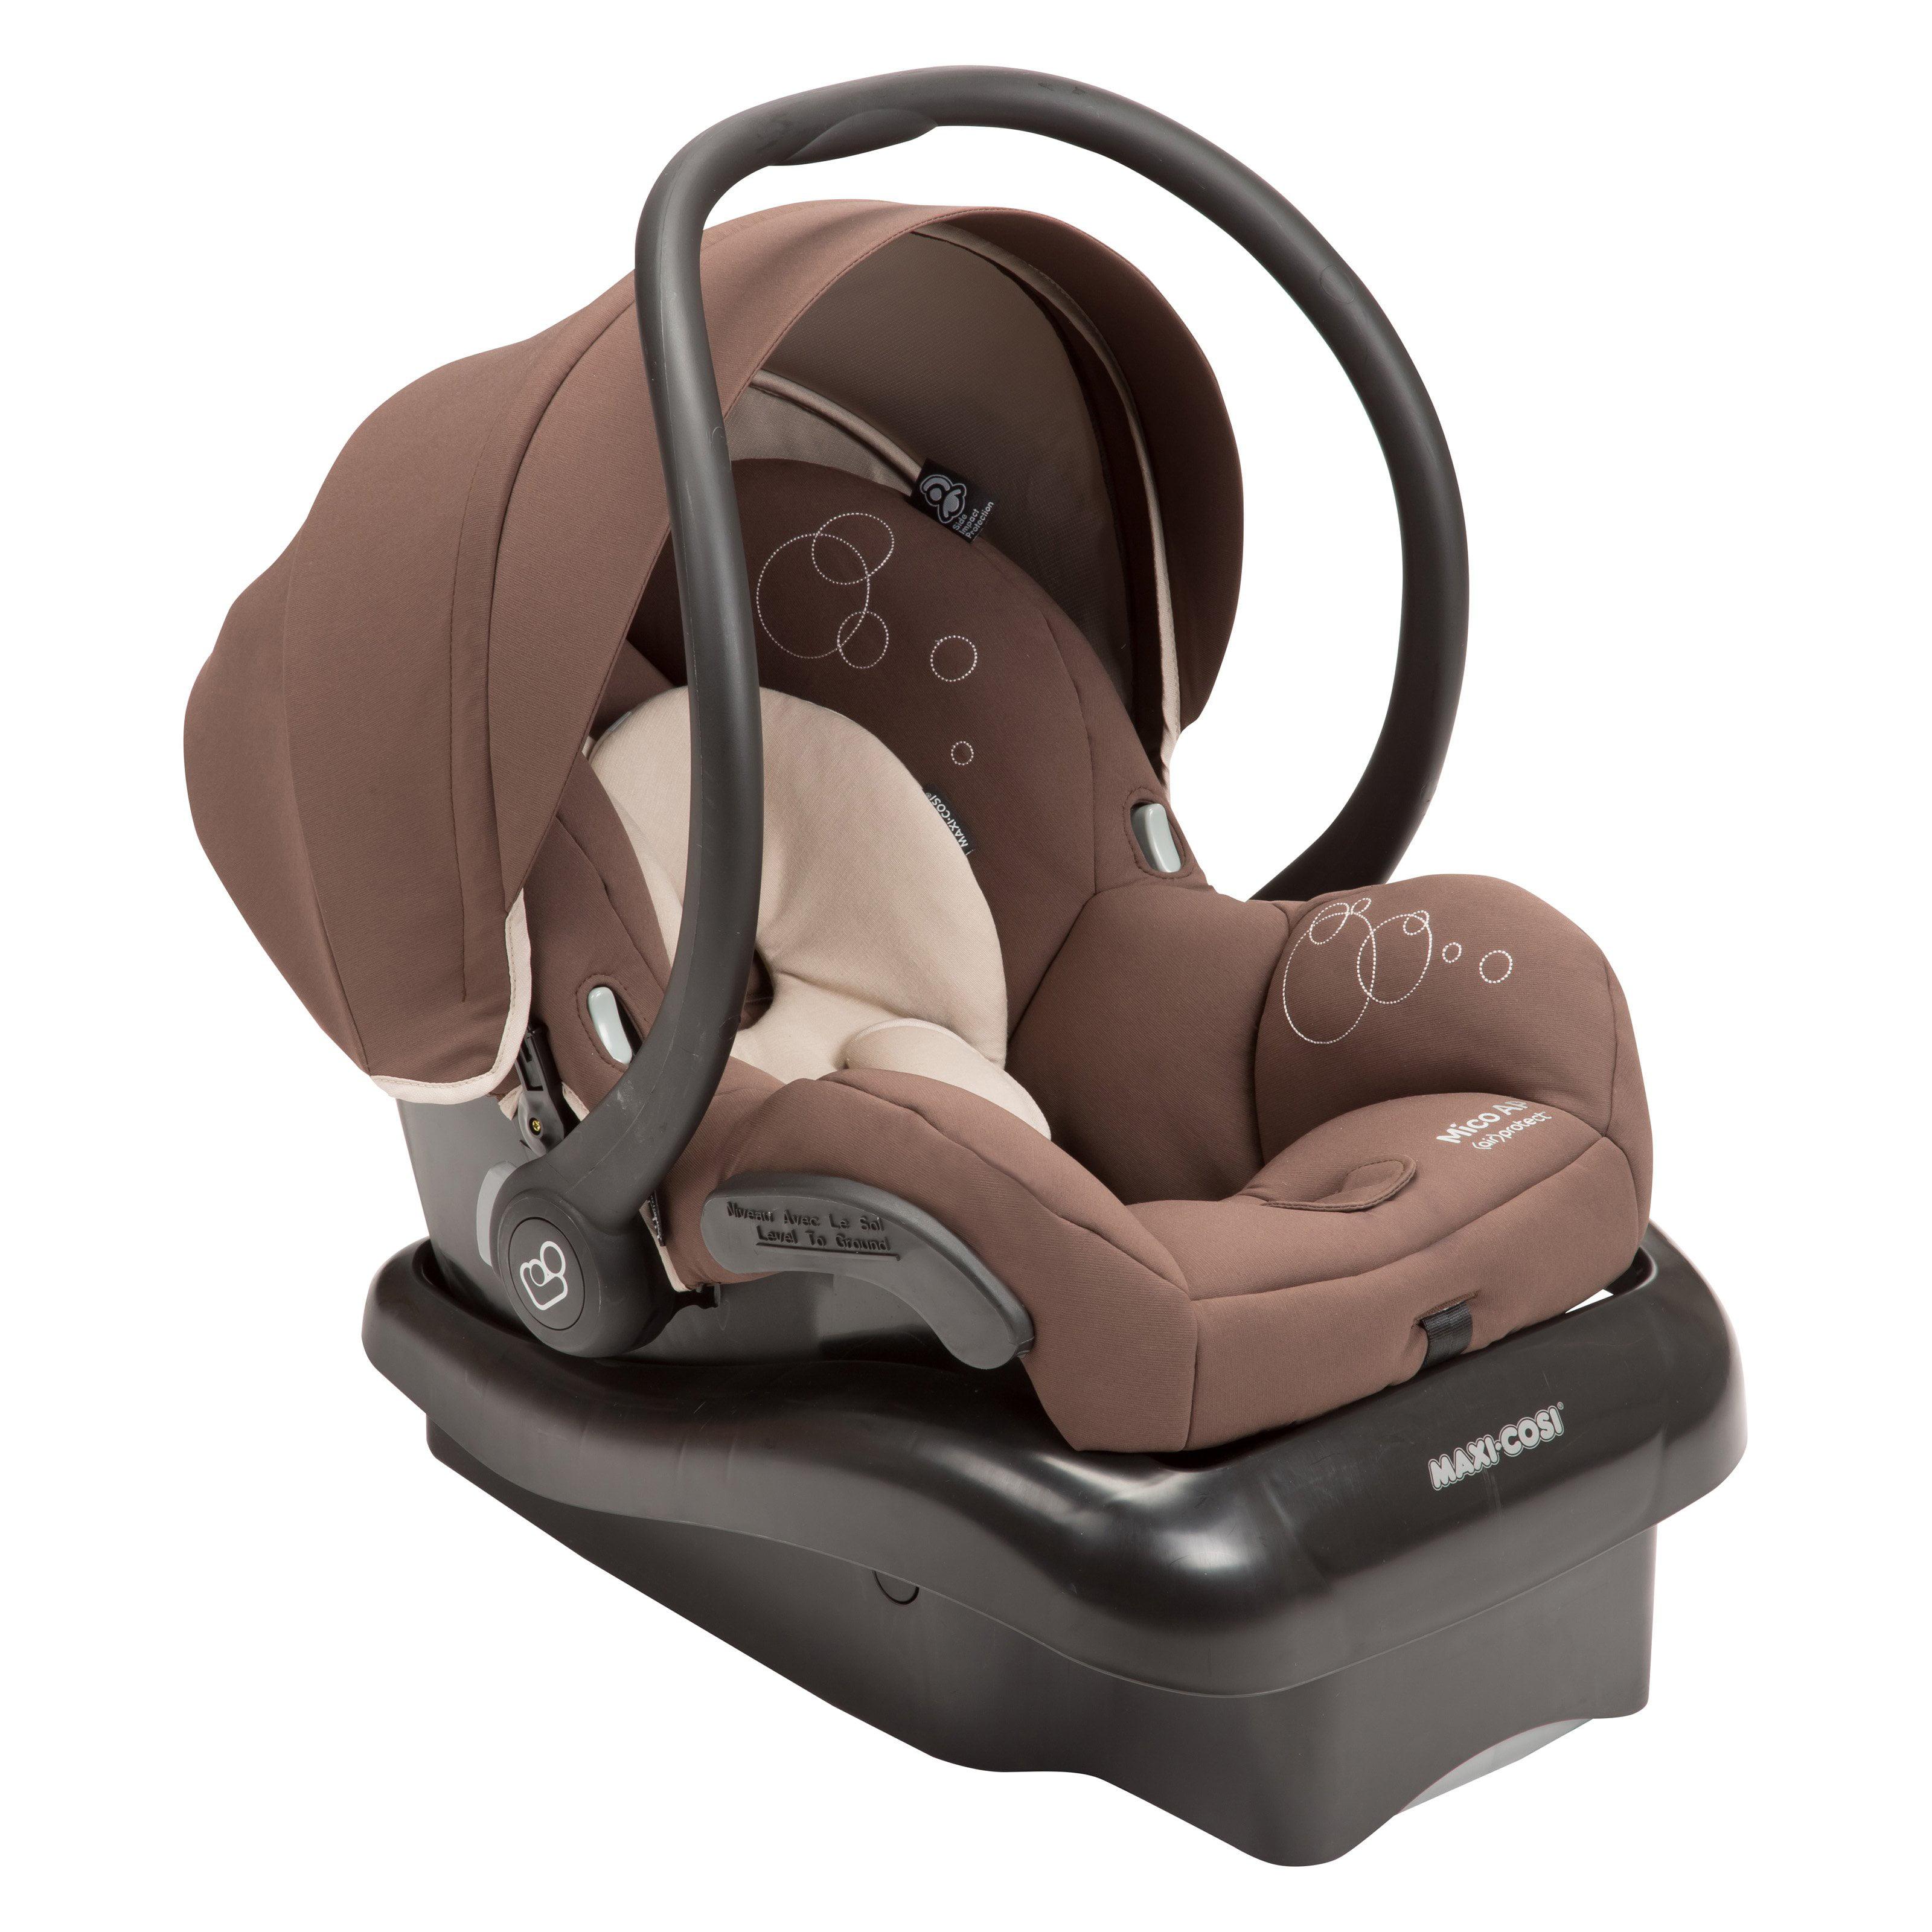 Maxi Cosi Mico Ap Infant Car Seat Milk Chocolate Walmart Com